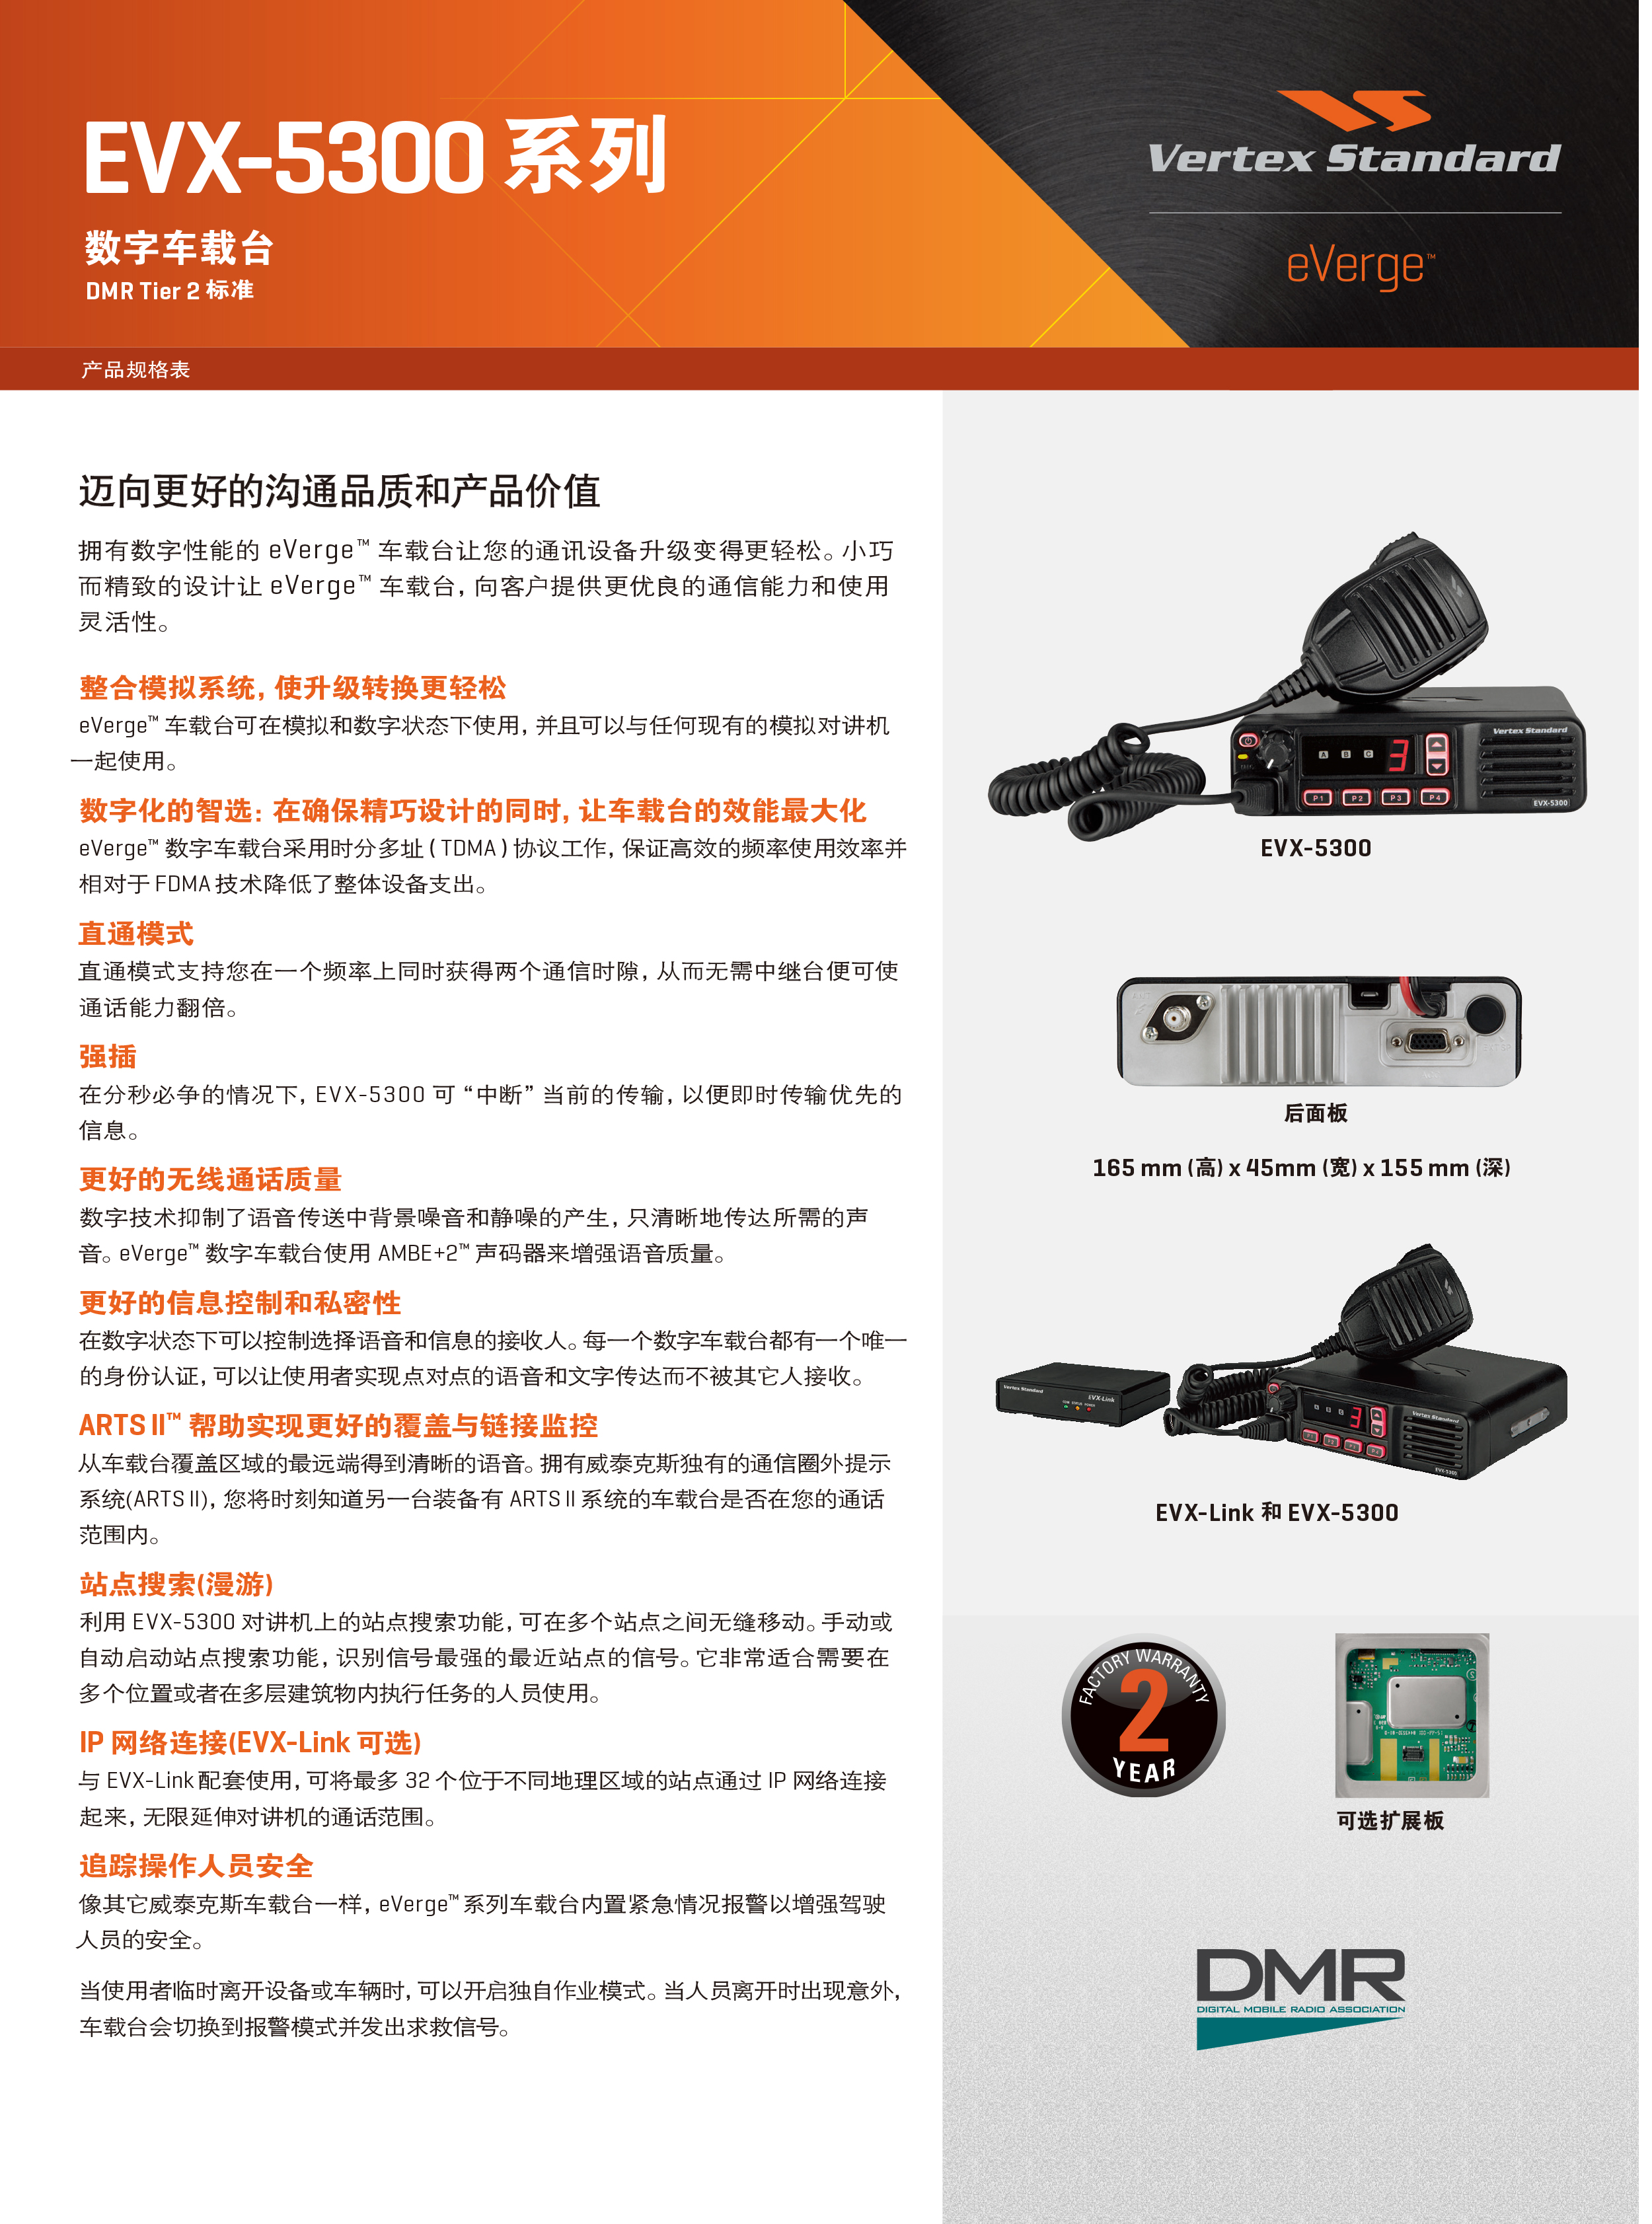 EVX-5300彩页_01